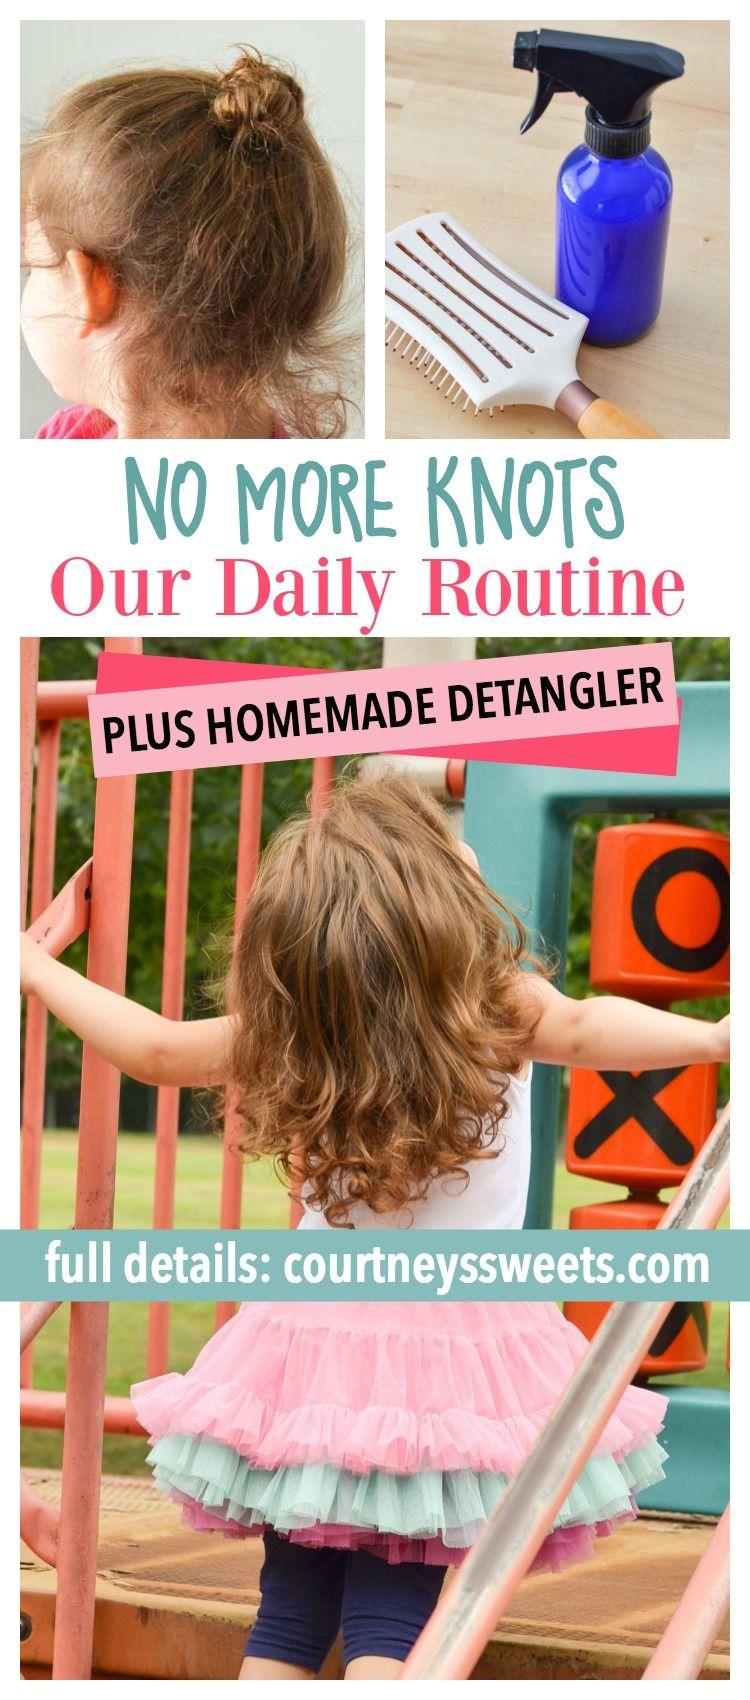 No more knots our daily routine with homemade detangler homemade